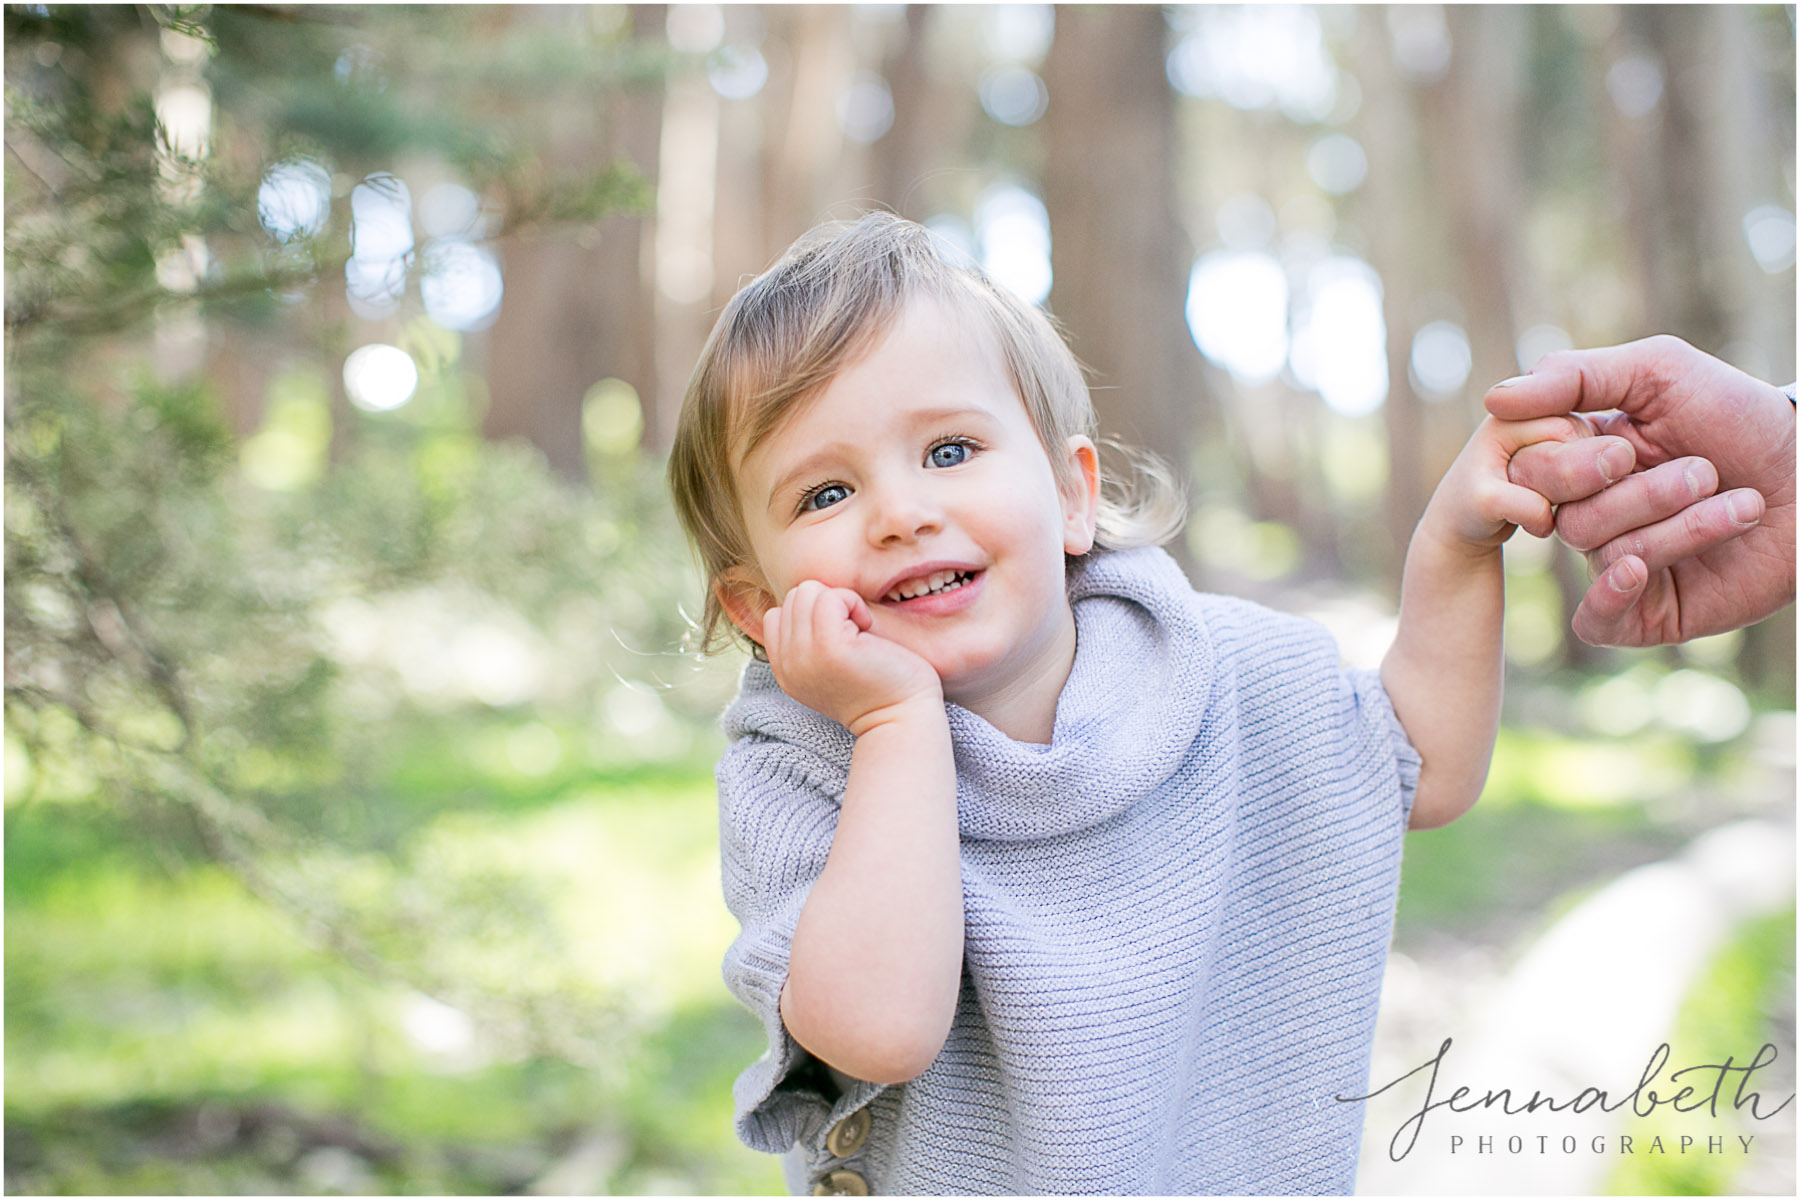 JennaBethPhotography-Gendreau-6.jpg